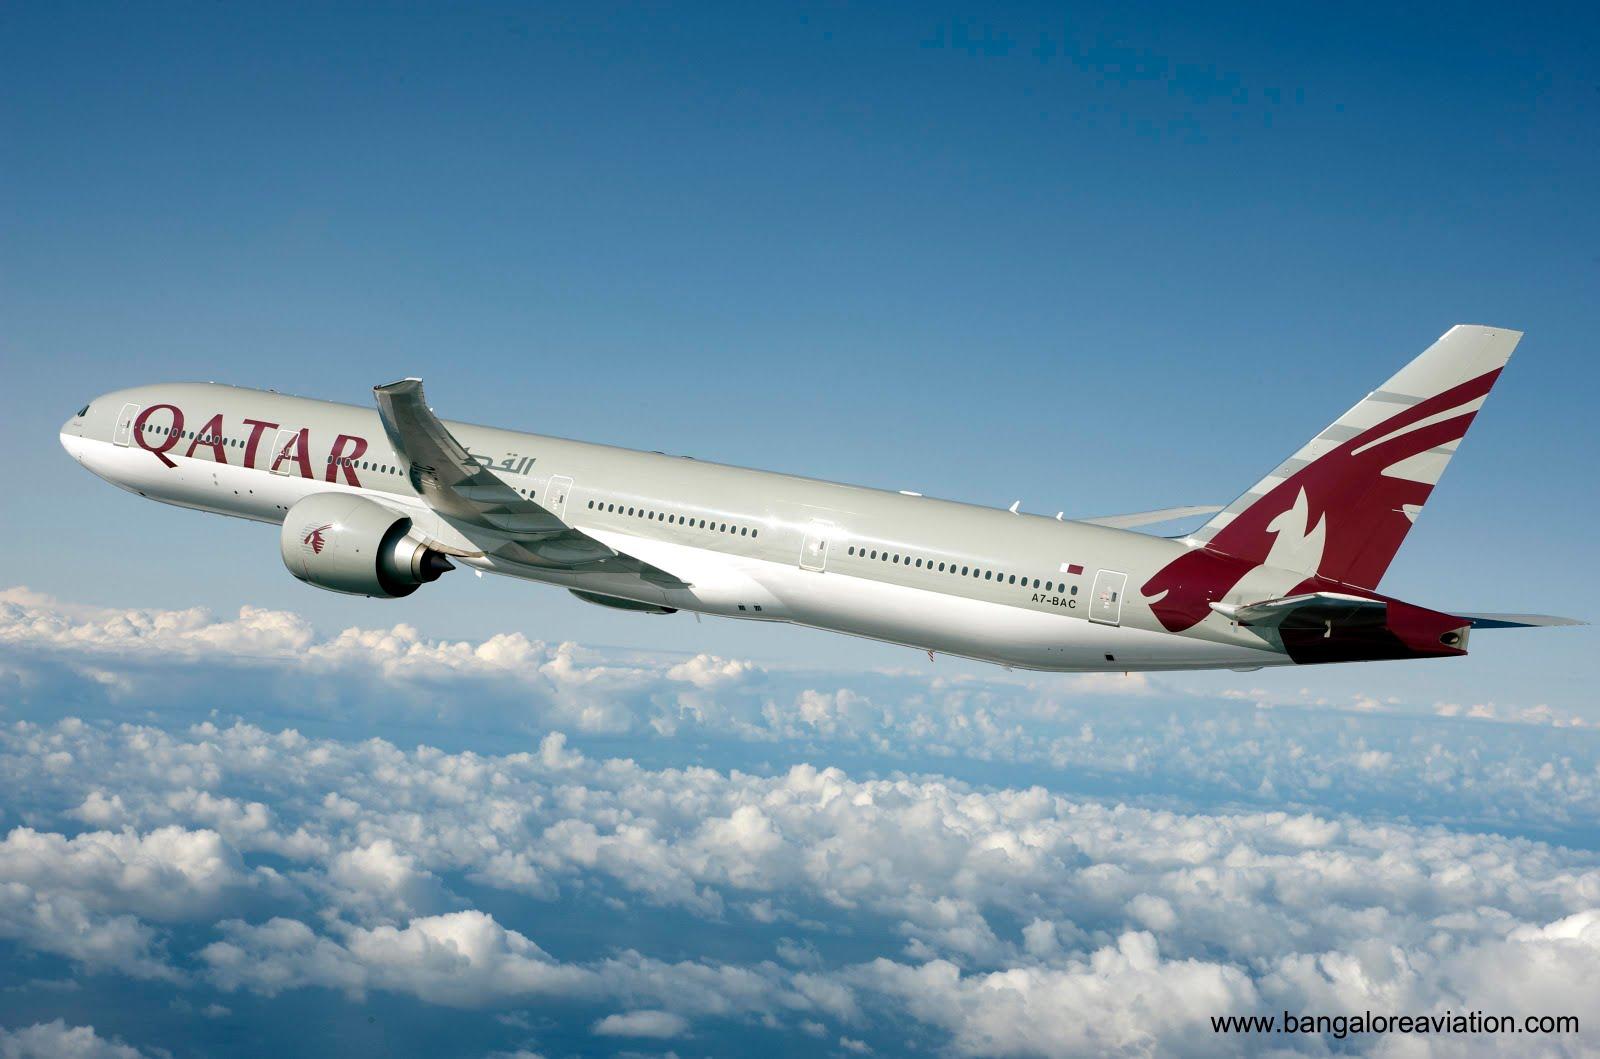 http://1.bp.blogspot.com/-yBLKttAr6ag/TvAzfryiGtI/AAAAAAAAgZs/0MVYe2my8Y4/s1600/Qatar_Airways_Boeing_777-300ER_A7-BAC.jpg